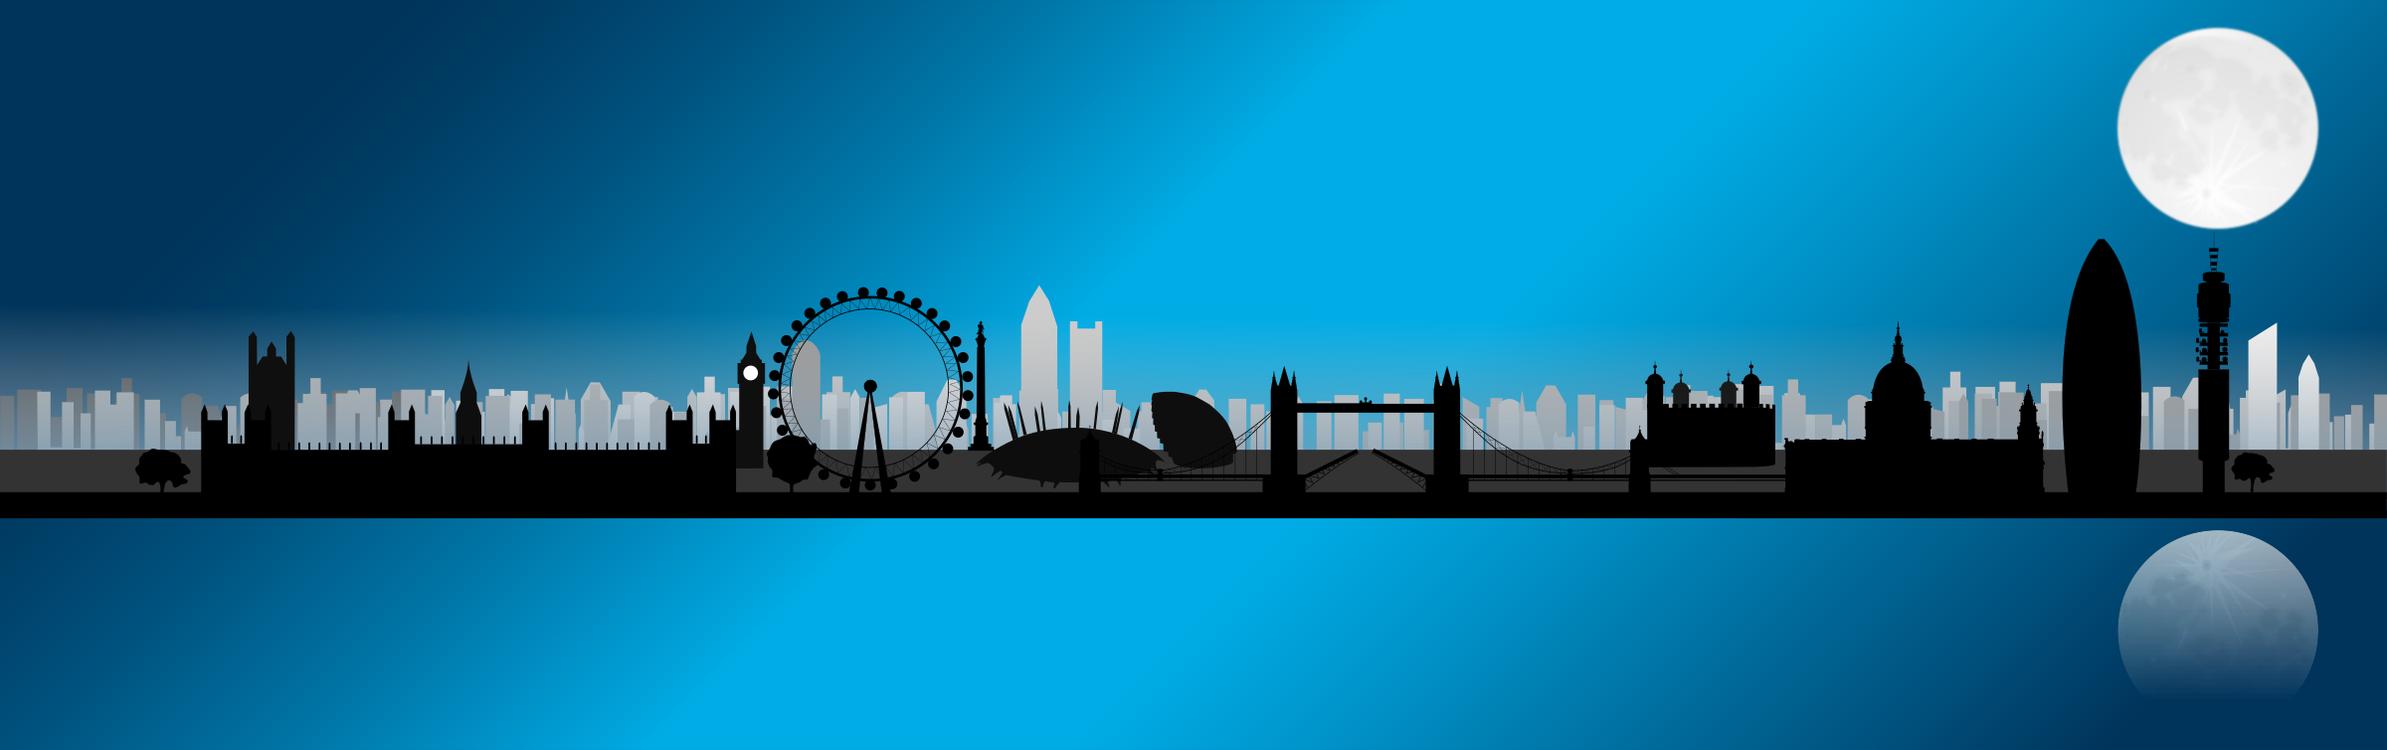 Blue,City,Metropolis